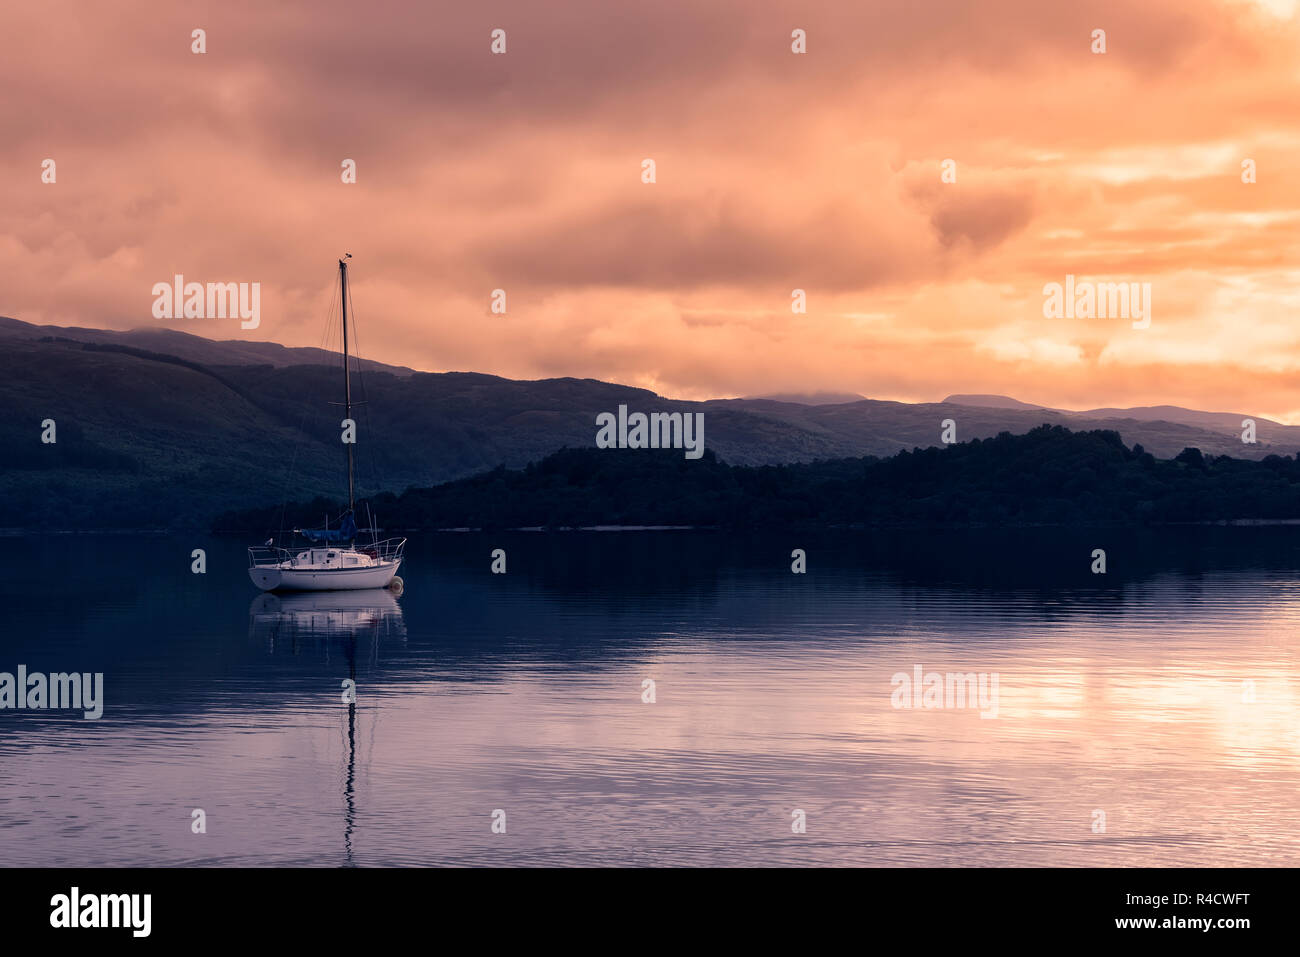 West shore of Loch Lomond in the quaint village of Luss near Glasgow, Scotland. - Stock Image